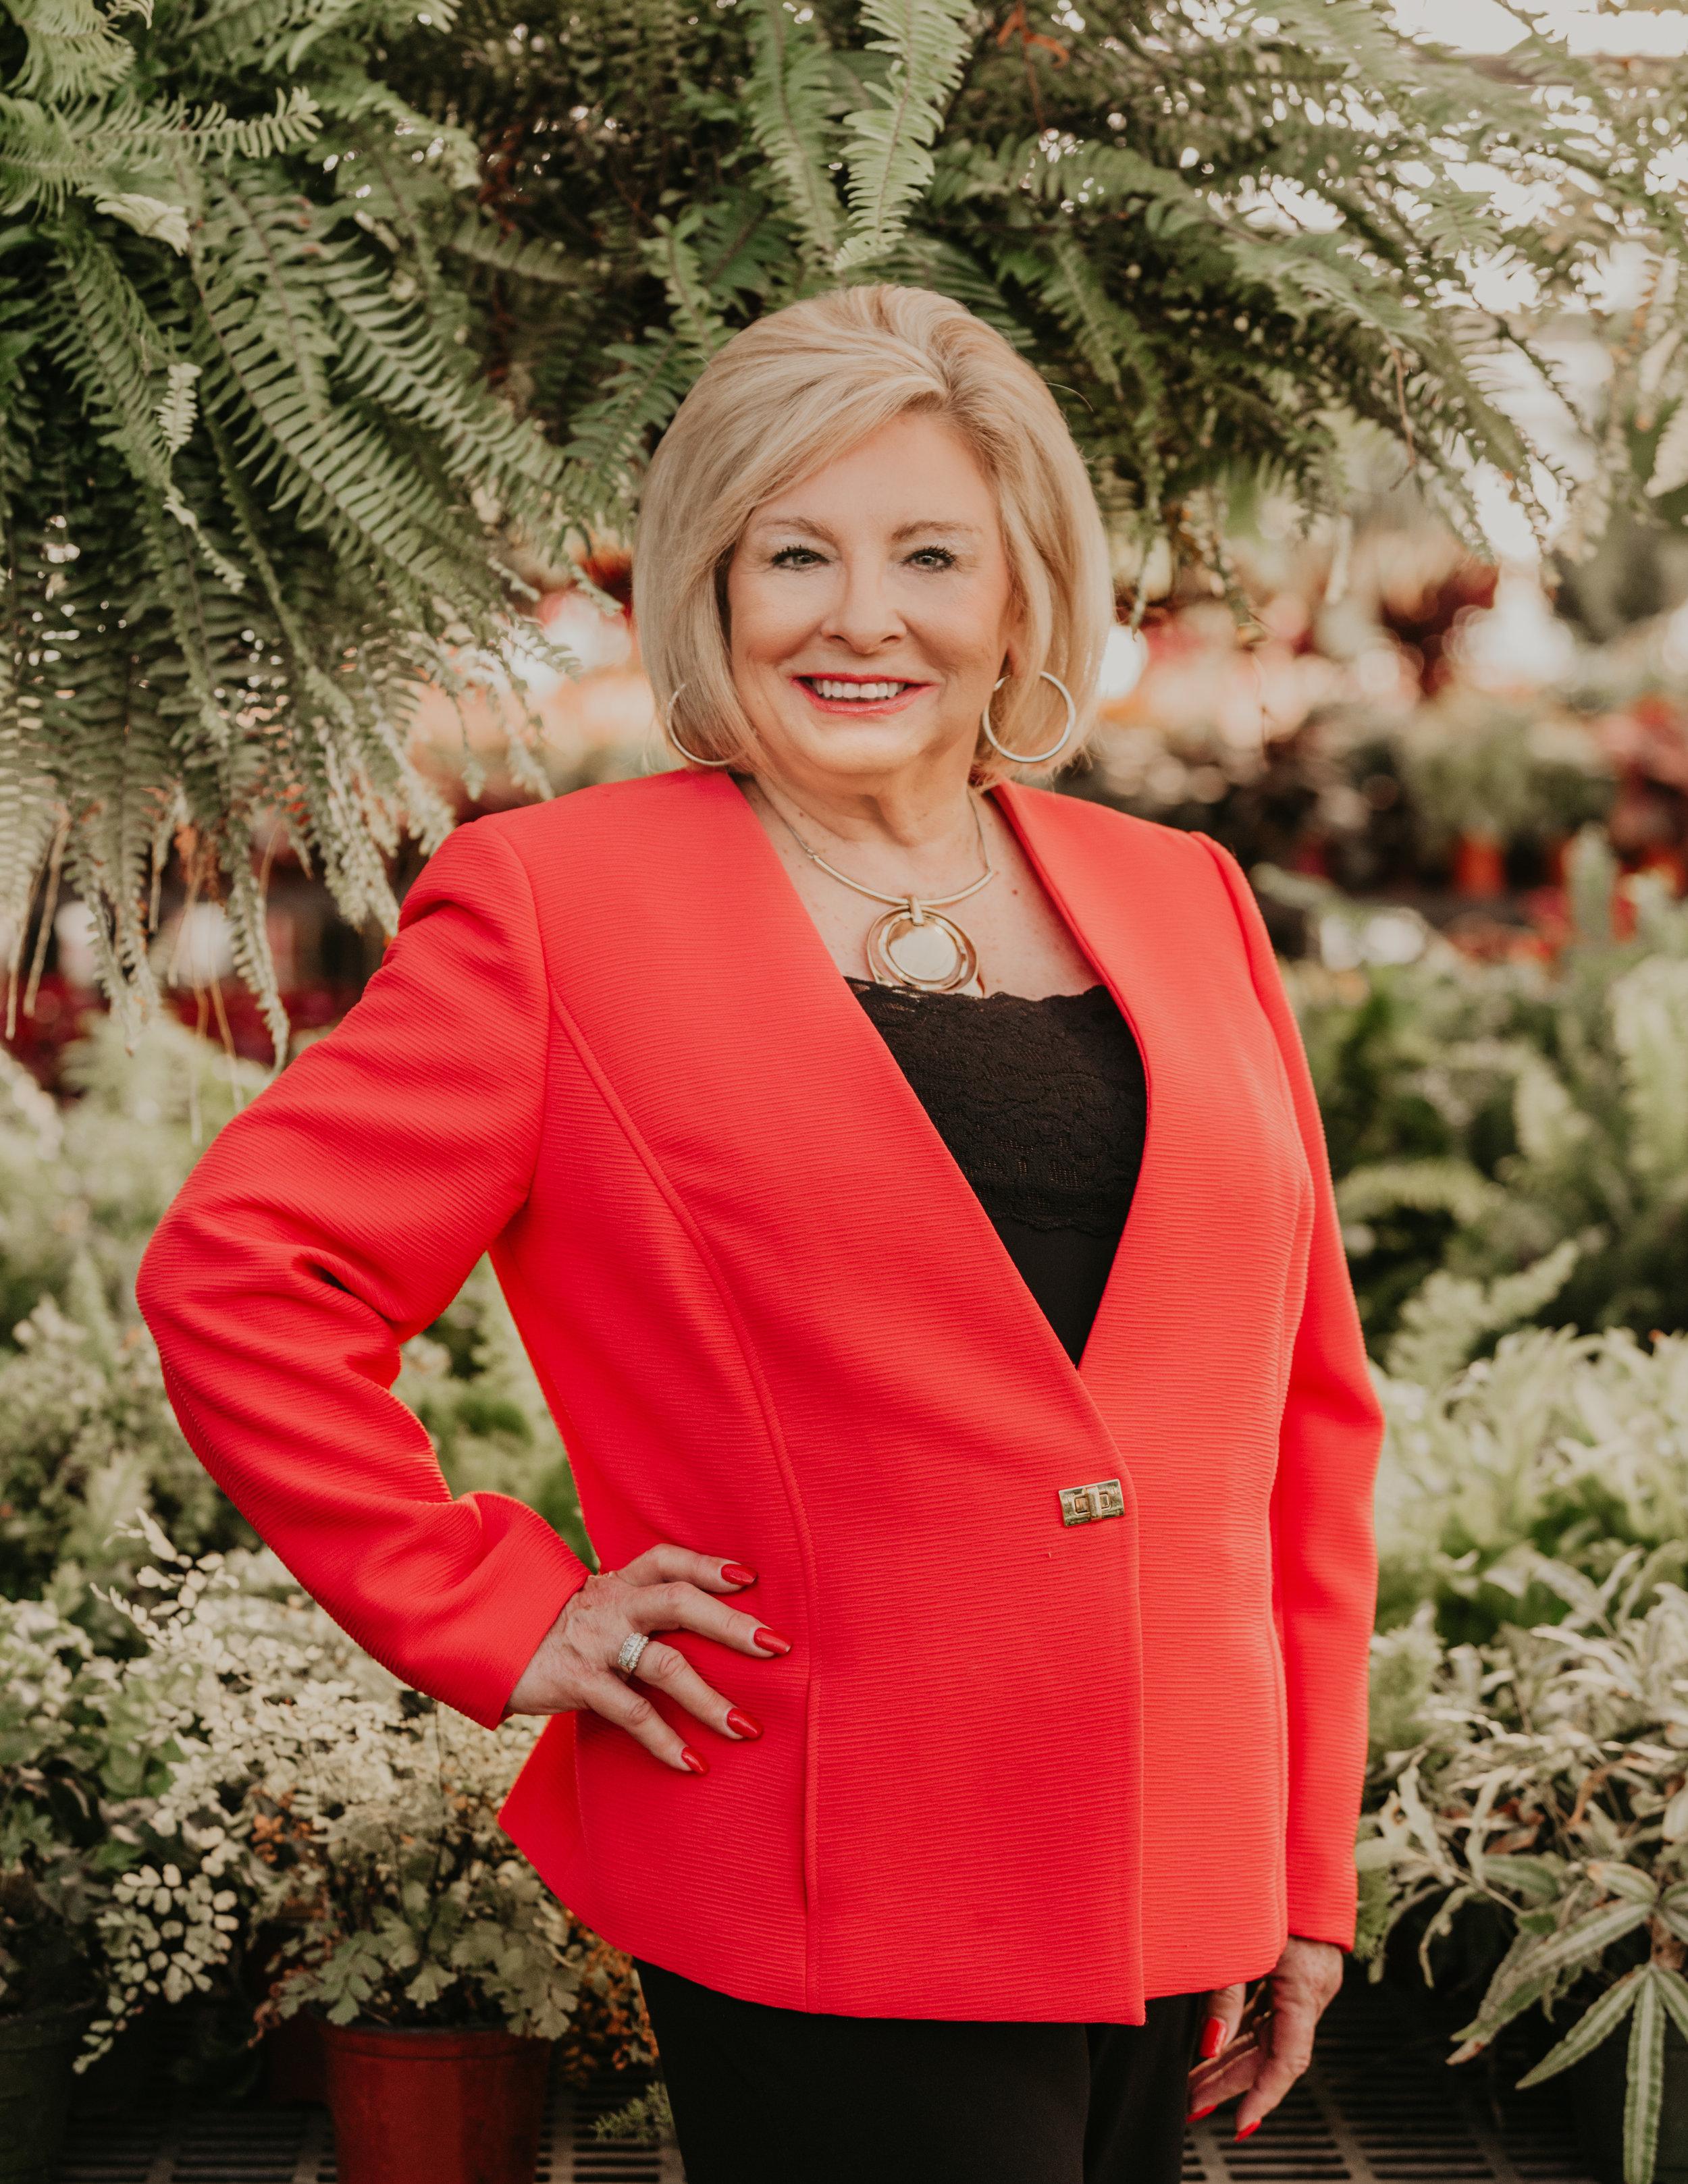 Sharon Yeary, Broker/Owner